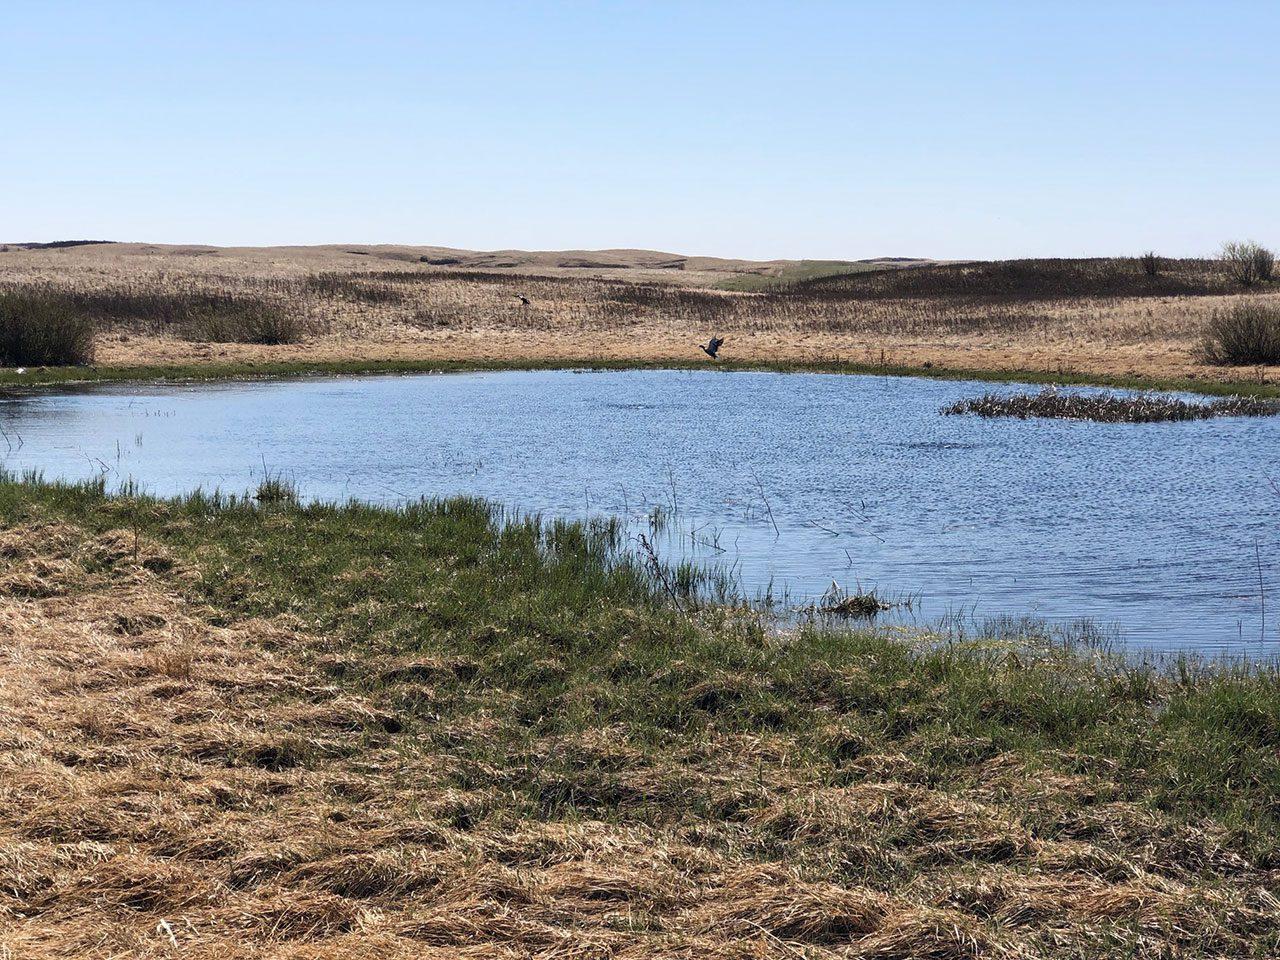 Southern Saskatchewan wetland, spring 2020